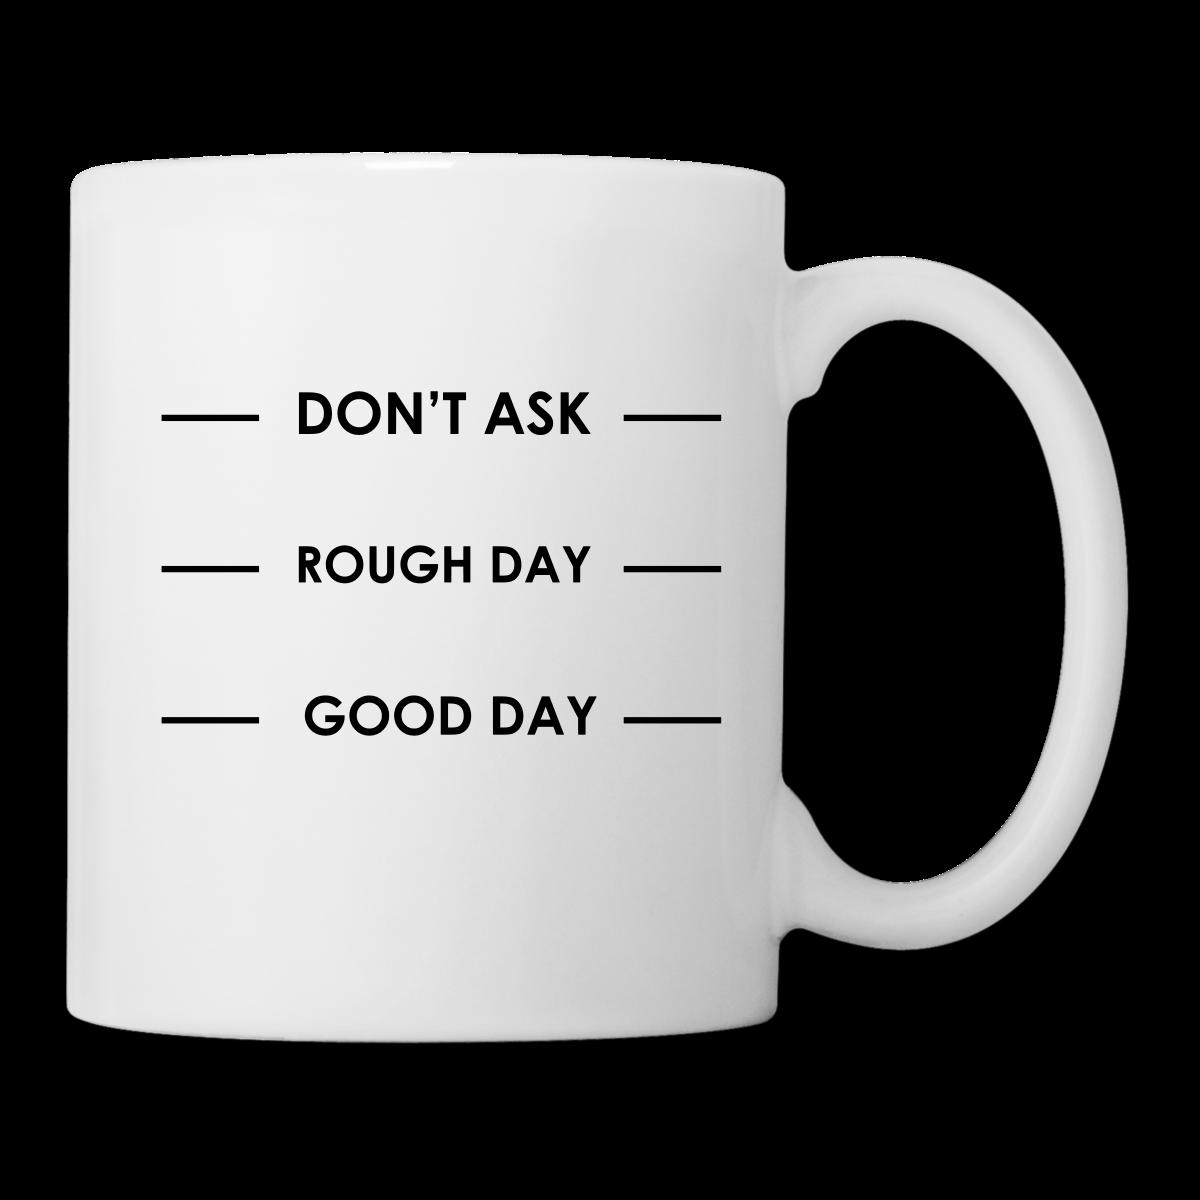 Funny Error quote Coffee Mug